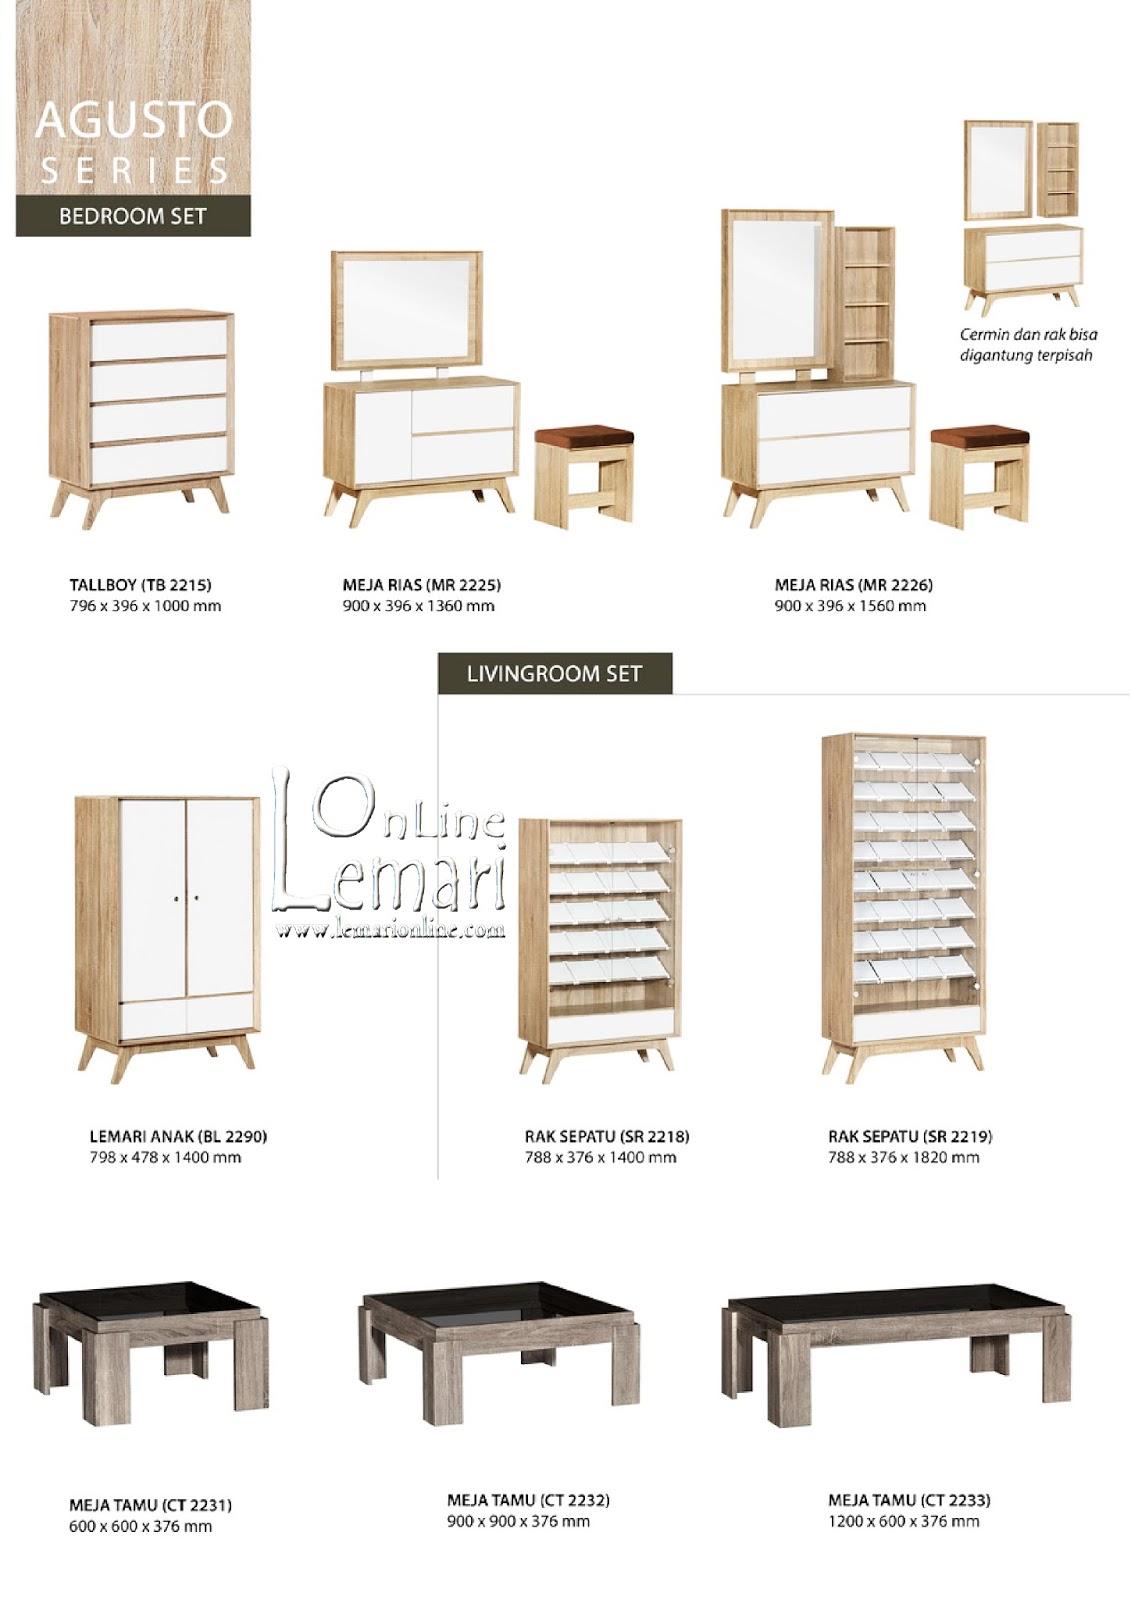 Graver Furniture Meja Rias Mr 92262 Daftar Harga Terkini Fcenter Siantano 905 Jawa Tengahdiyjawa Timur Agusto Series